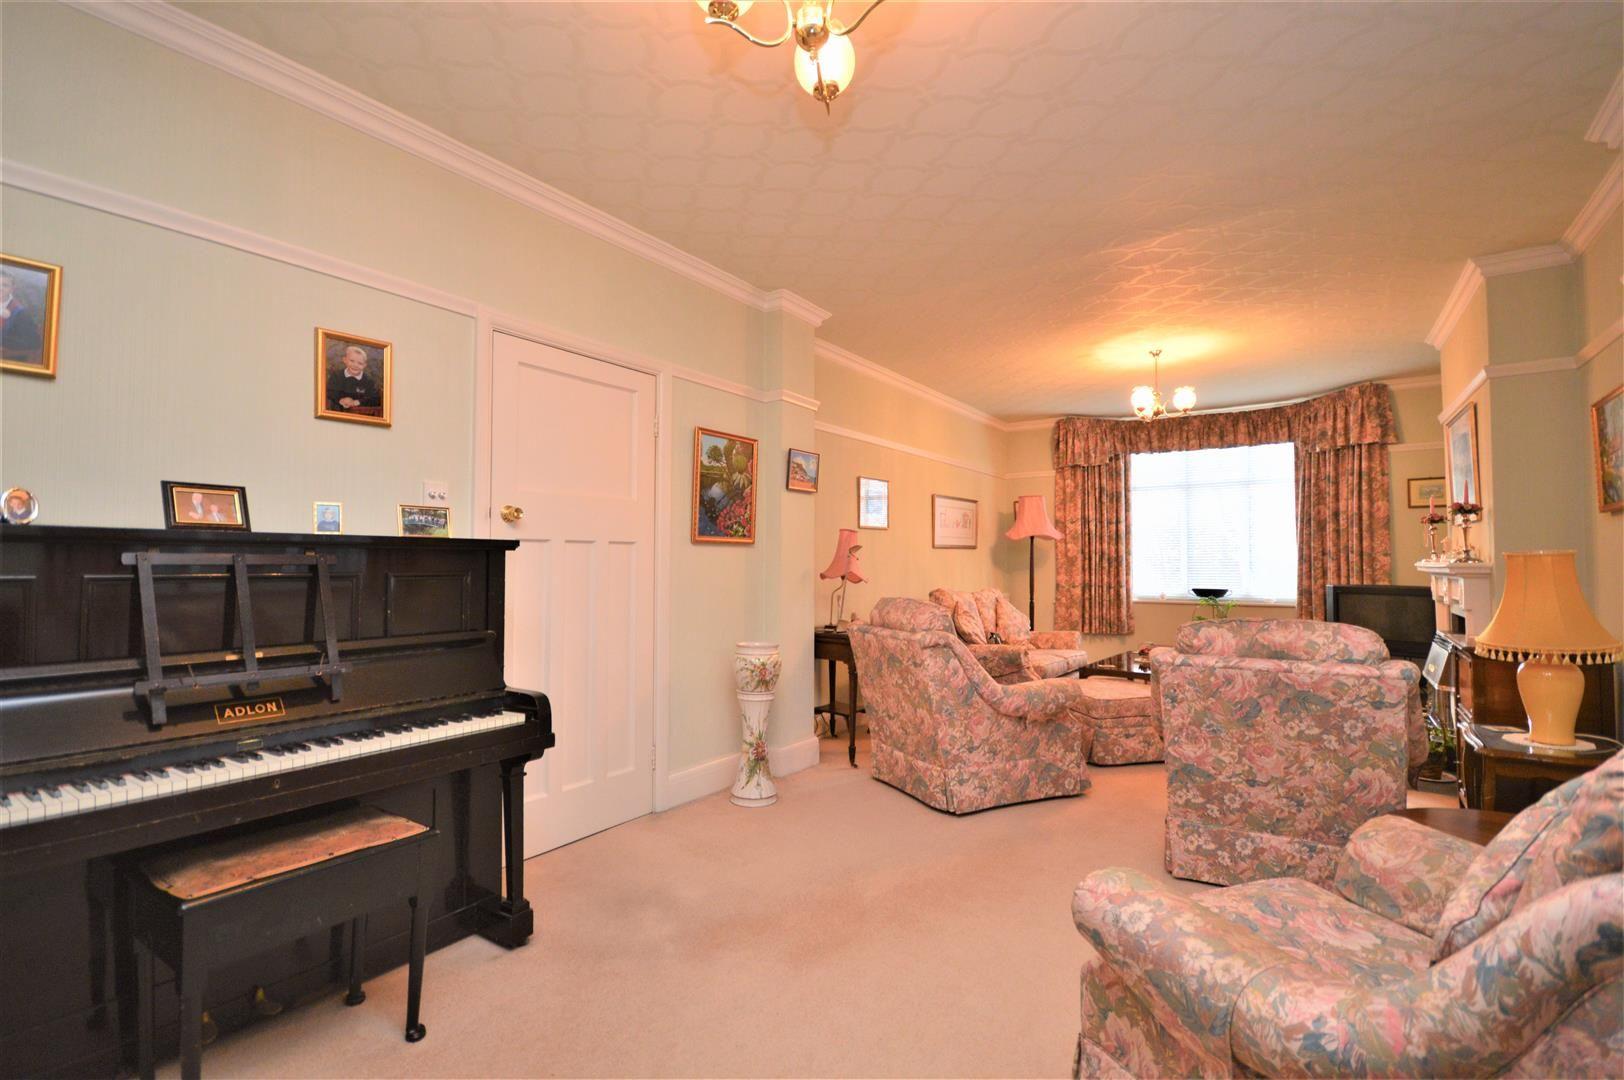 4 bed detached for sale in Bobblestock  - Property Image 6